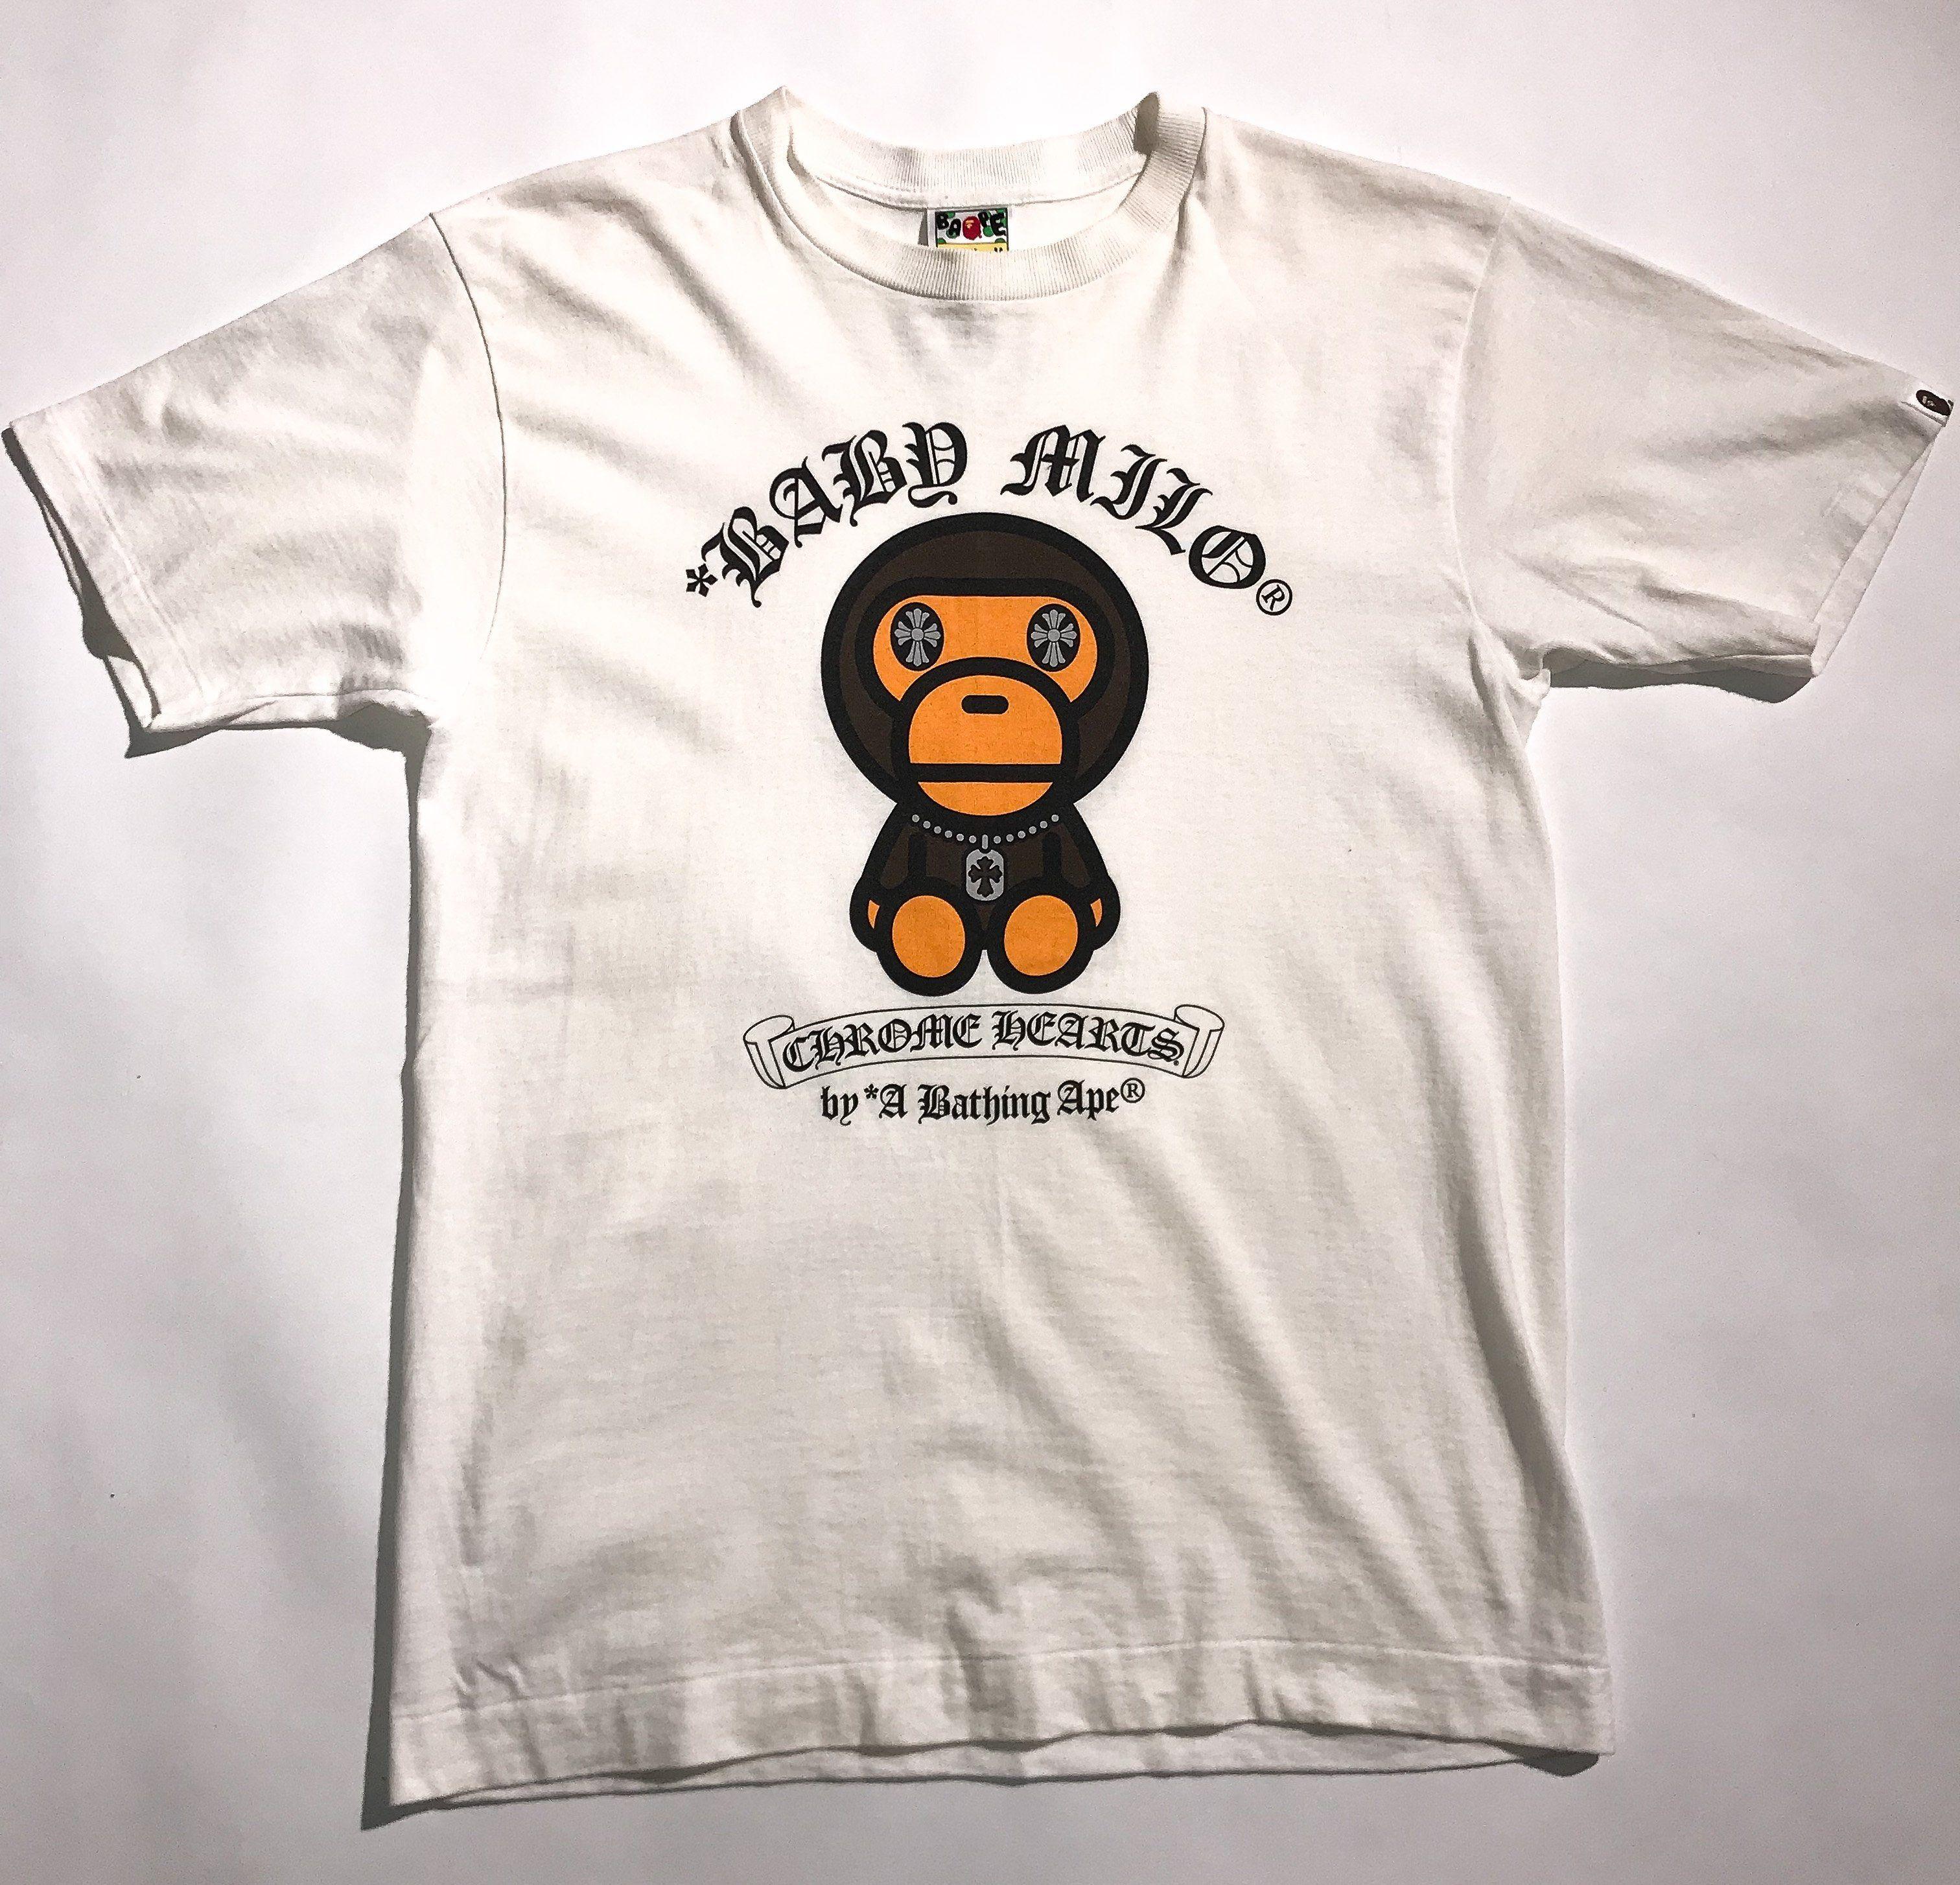 bape shirt kopen